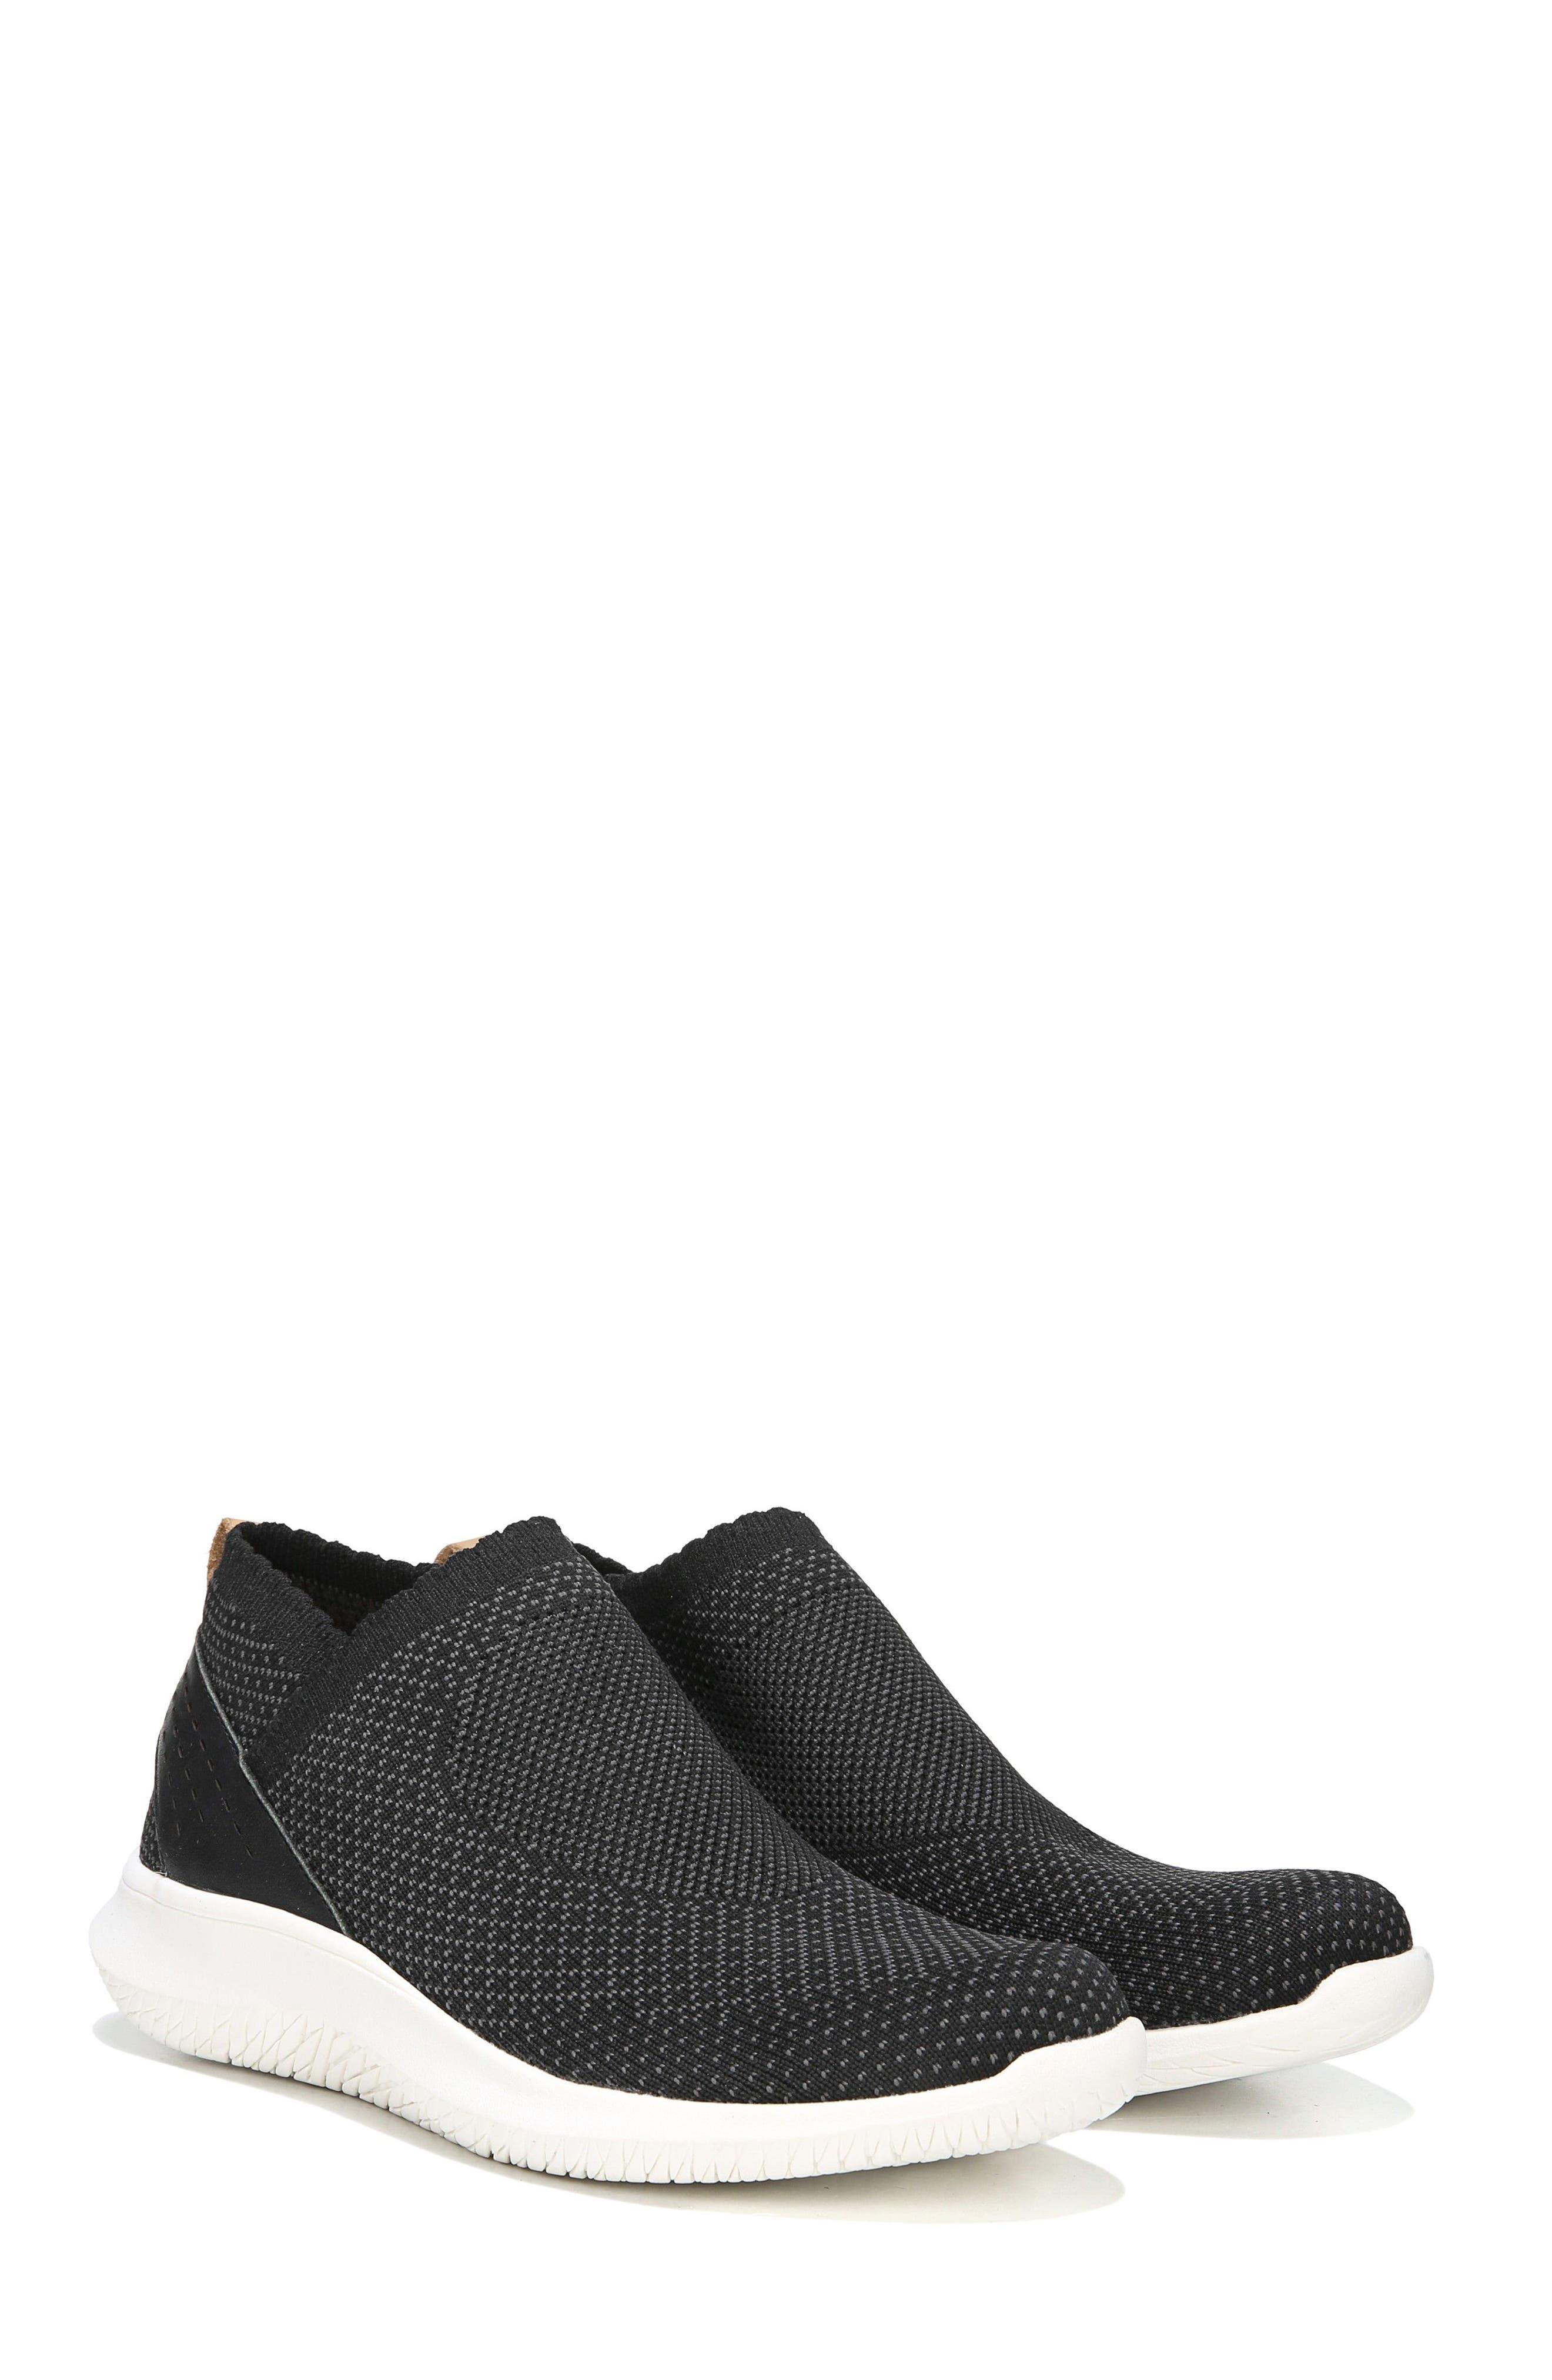 Fierce Knit Slip-On Sneaker,                             Alternate thumbnail 7, color,                             BLACK KNIT FABRIC